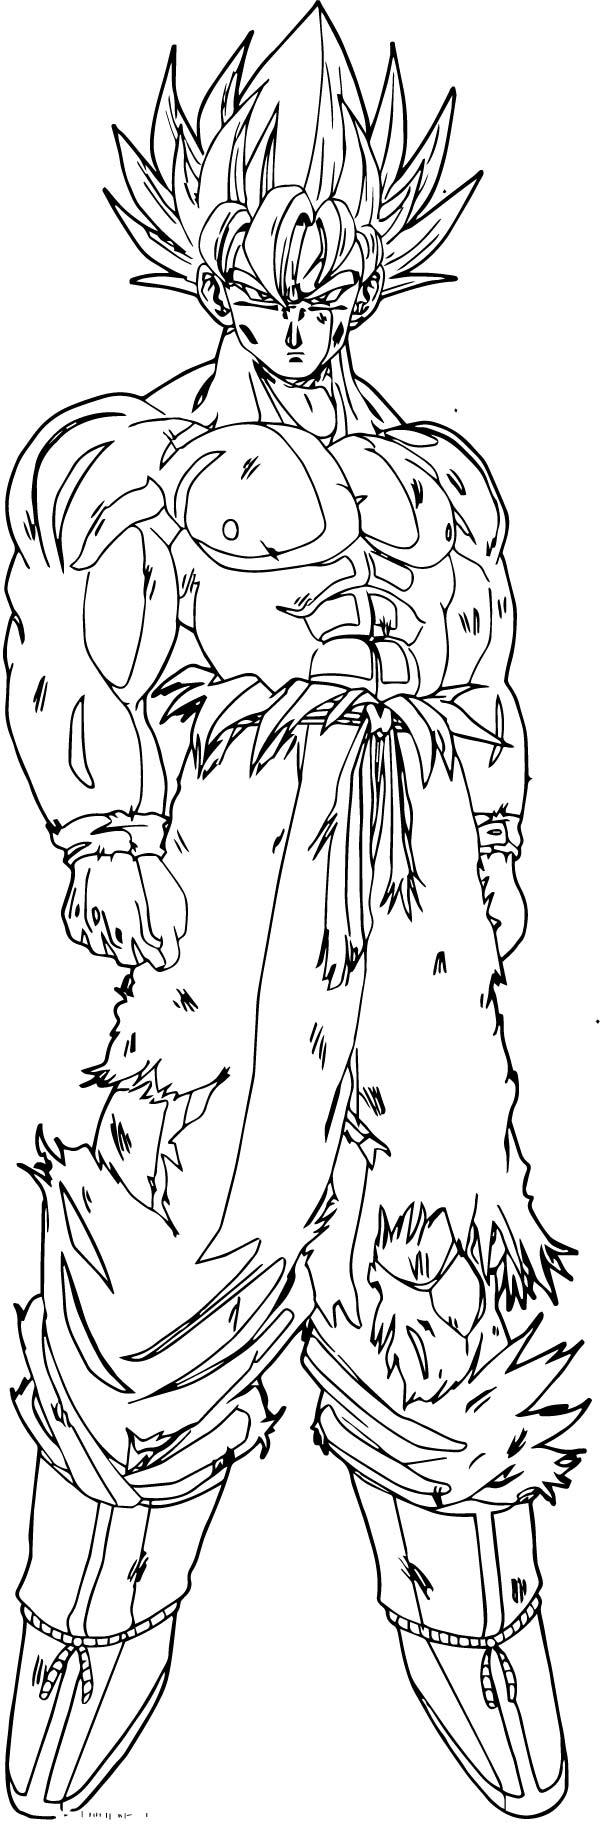 Goku We Coloring Page 443